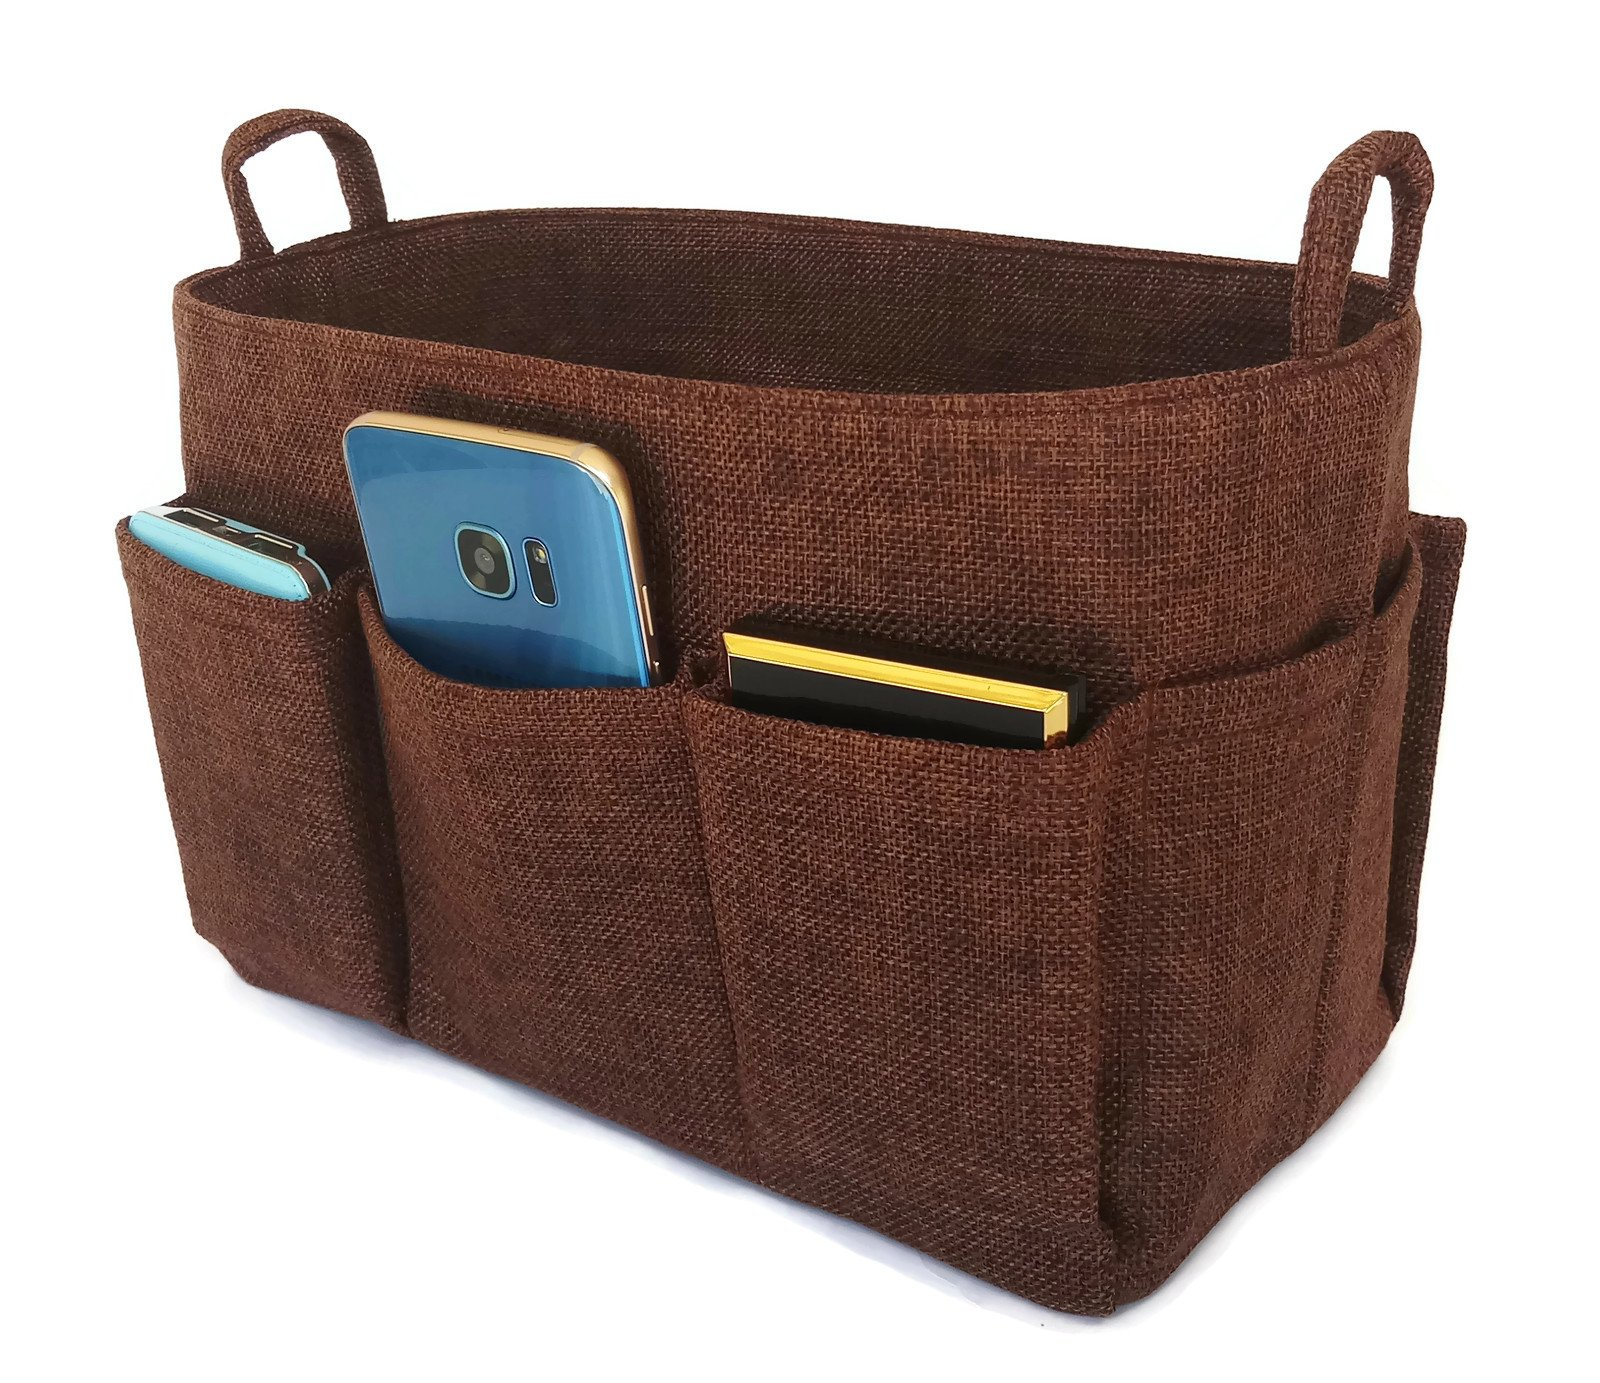 K&M Quality Product Medium Purse Organizer Insert, Tote Organizer, Handbag Organizer : Medium Size K&M (Chocolate)